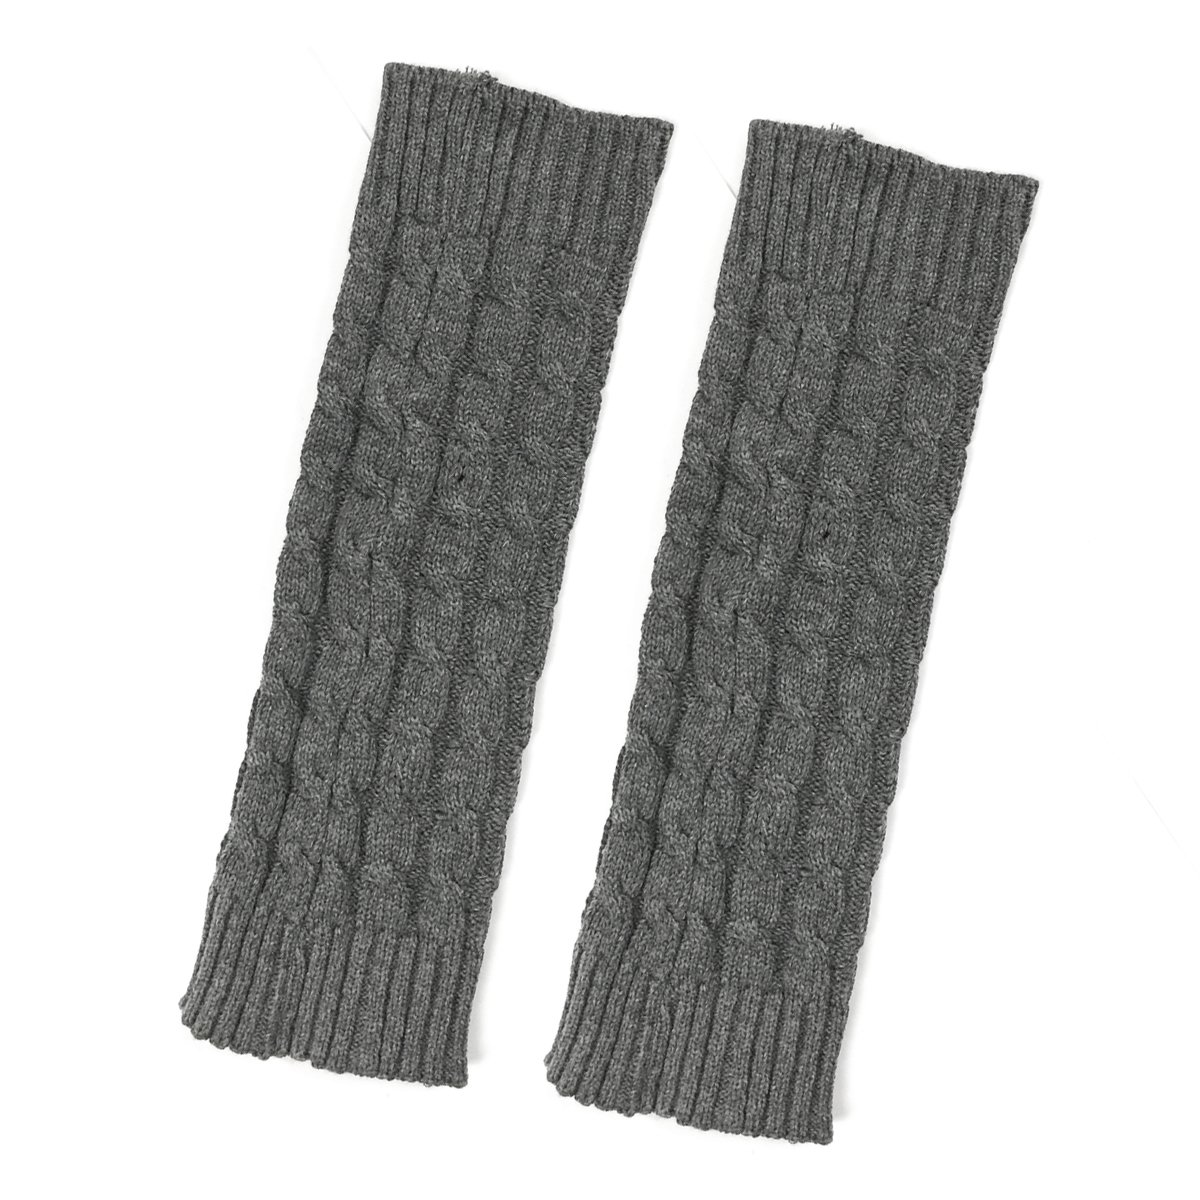 Bowbear Little Girls Cable Knit Leg Warmers, Gray